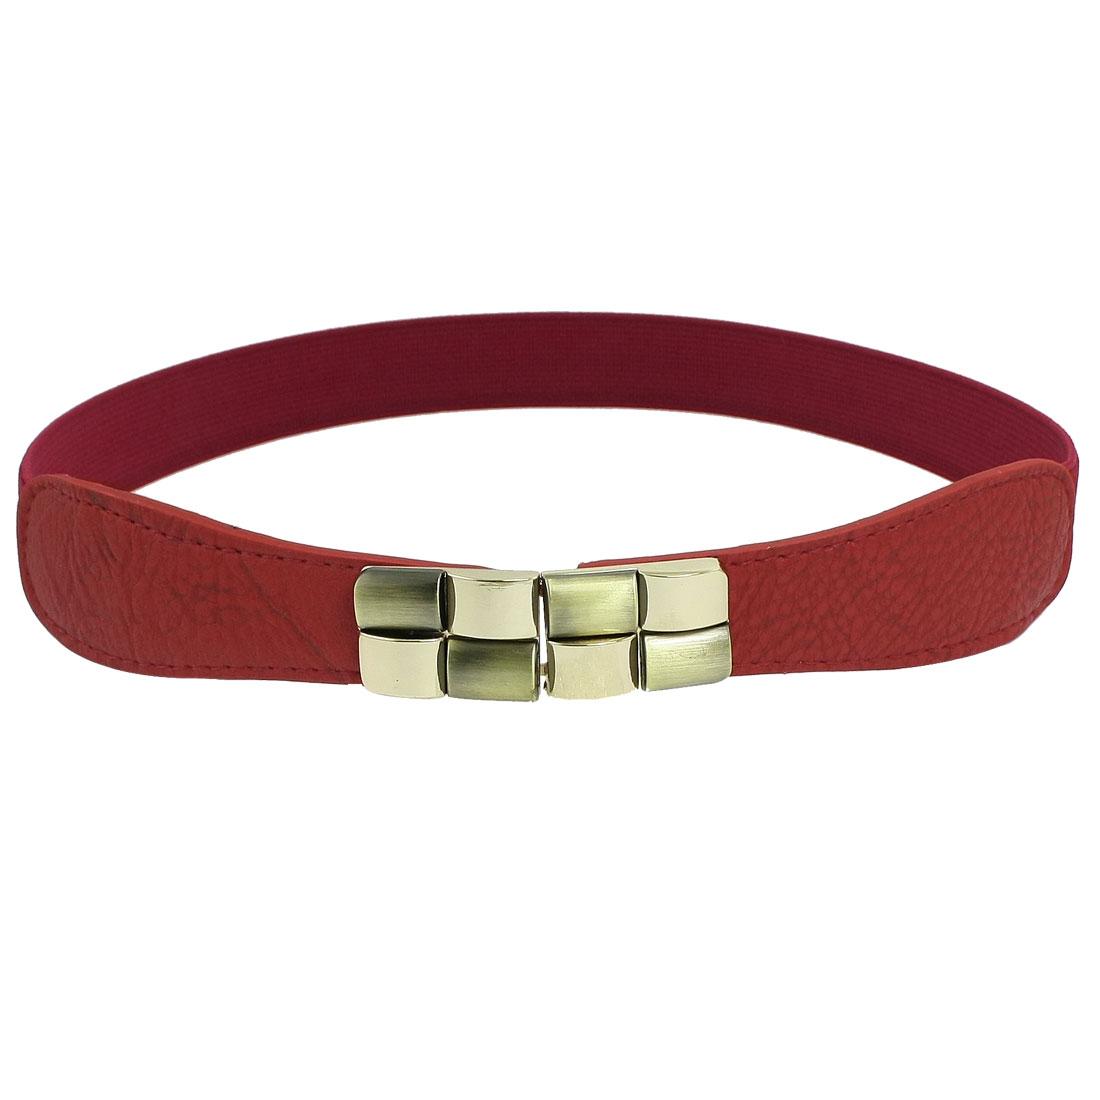 Red Elastic Cinch Metal Interlocking Buckle Waist Belt for Women